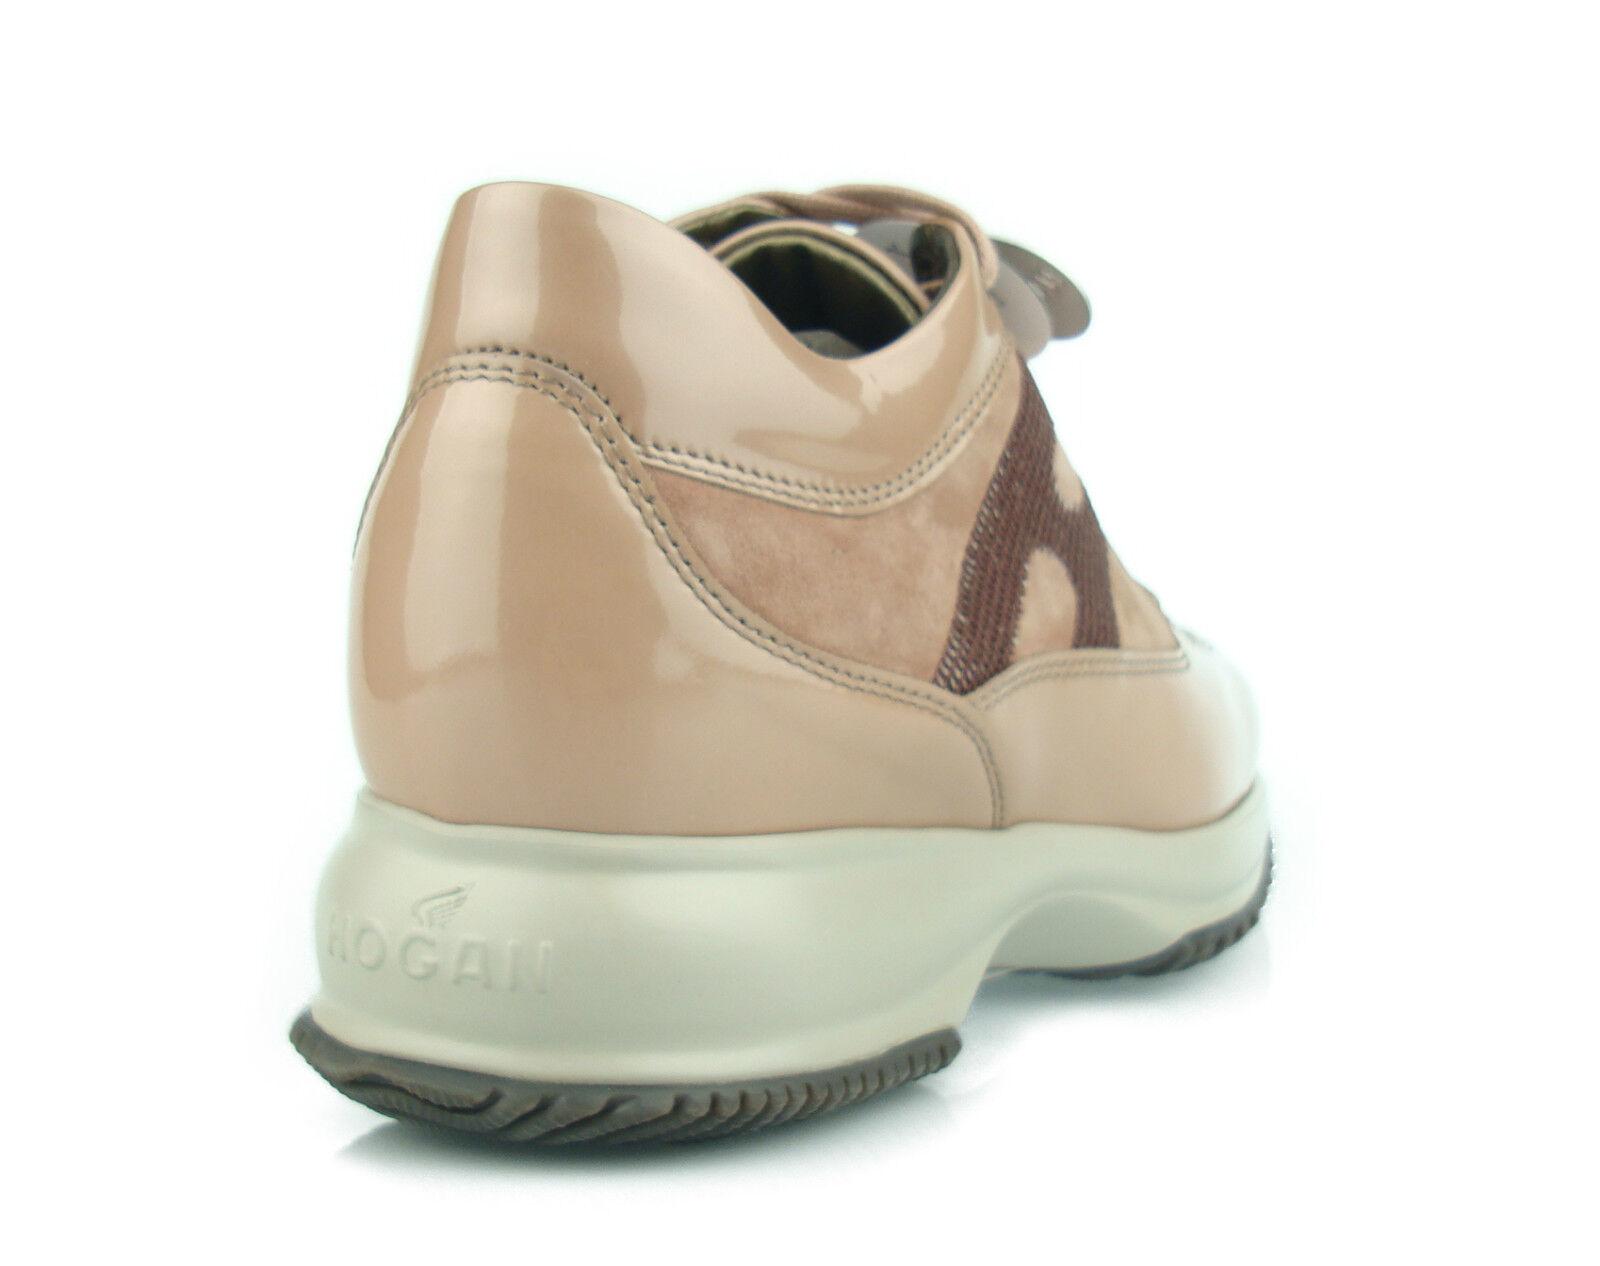 HOGAN Interactive STRASS rosa Schuhe Frauen Schuhe damenshuhe Frauen Frauen Frauen 100%aut 0e0140